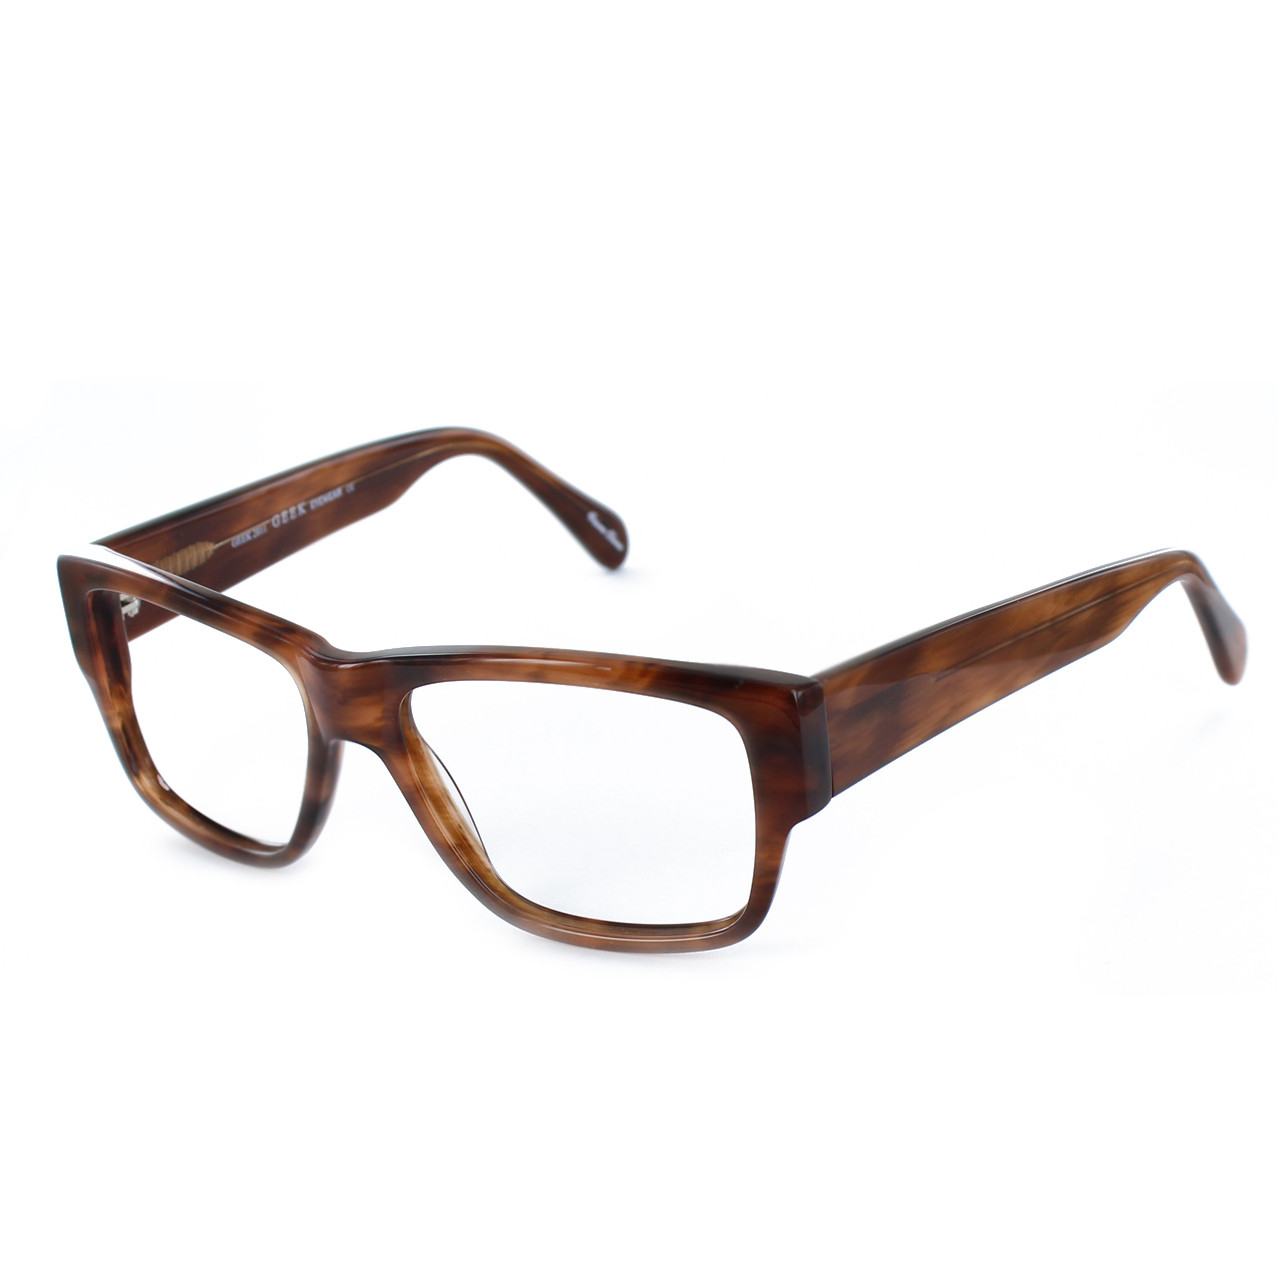 GEEK Eyewear GEEK 2011